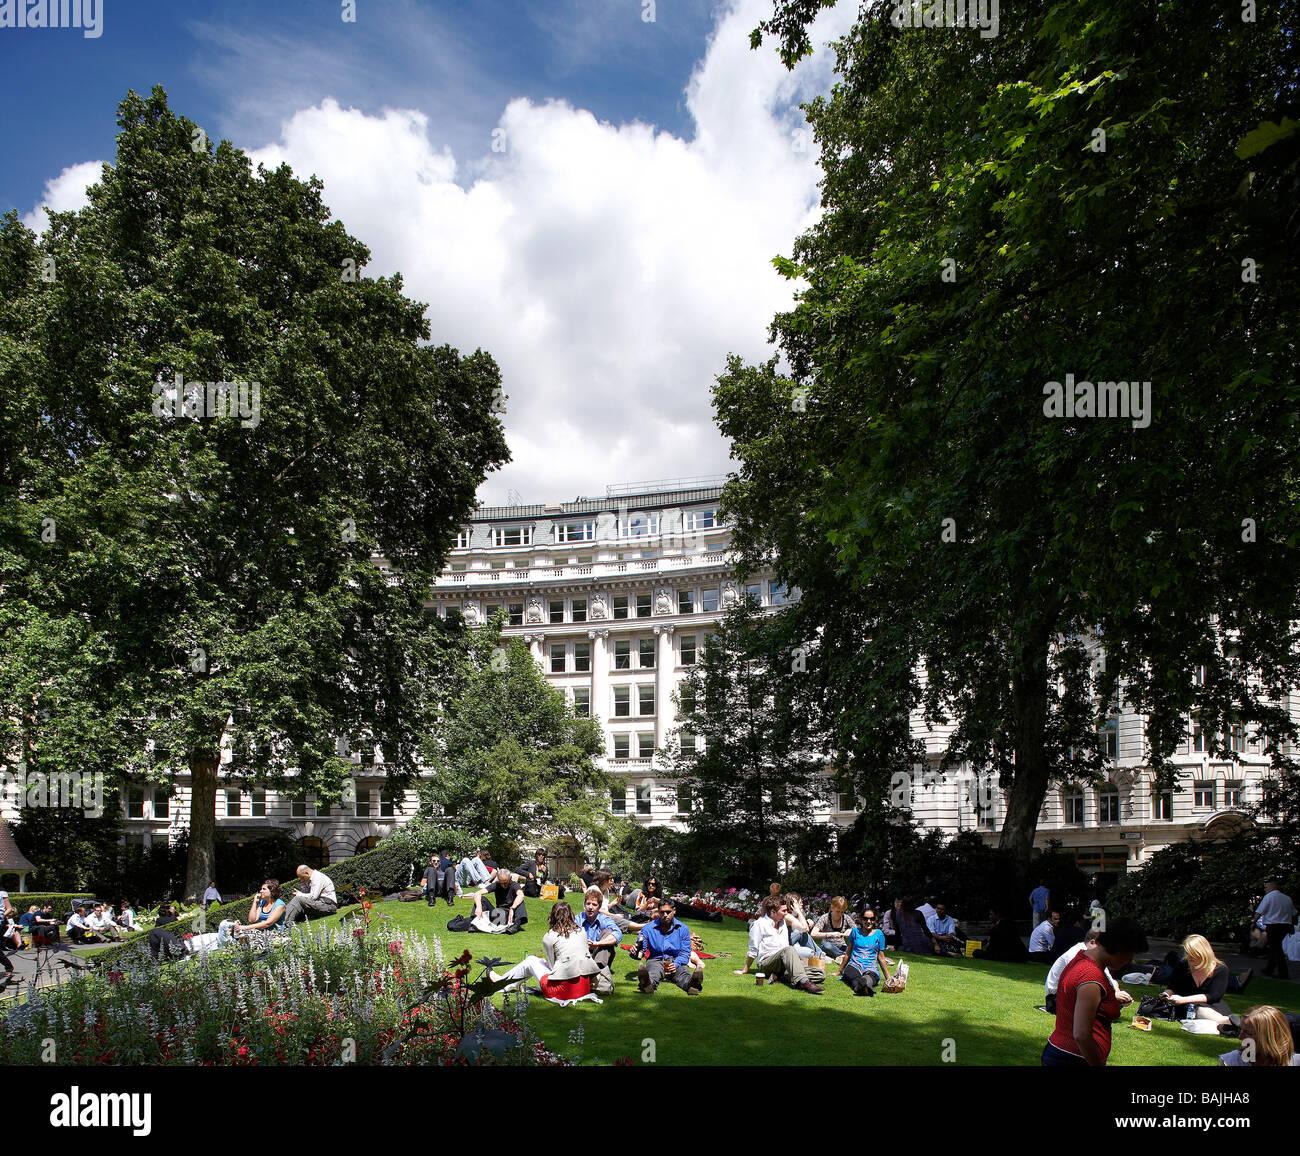 16 - 18 FINSBURY CIRCUS, JOHN ROBERTSON ARCHITECTS, LONDON, UNITED KINGDOM - Stock Image